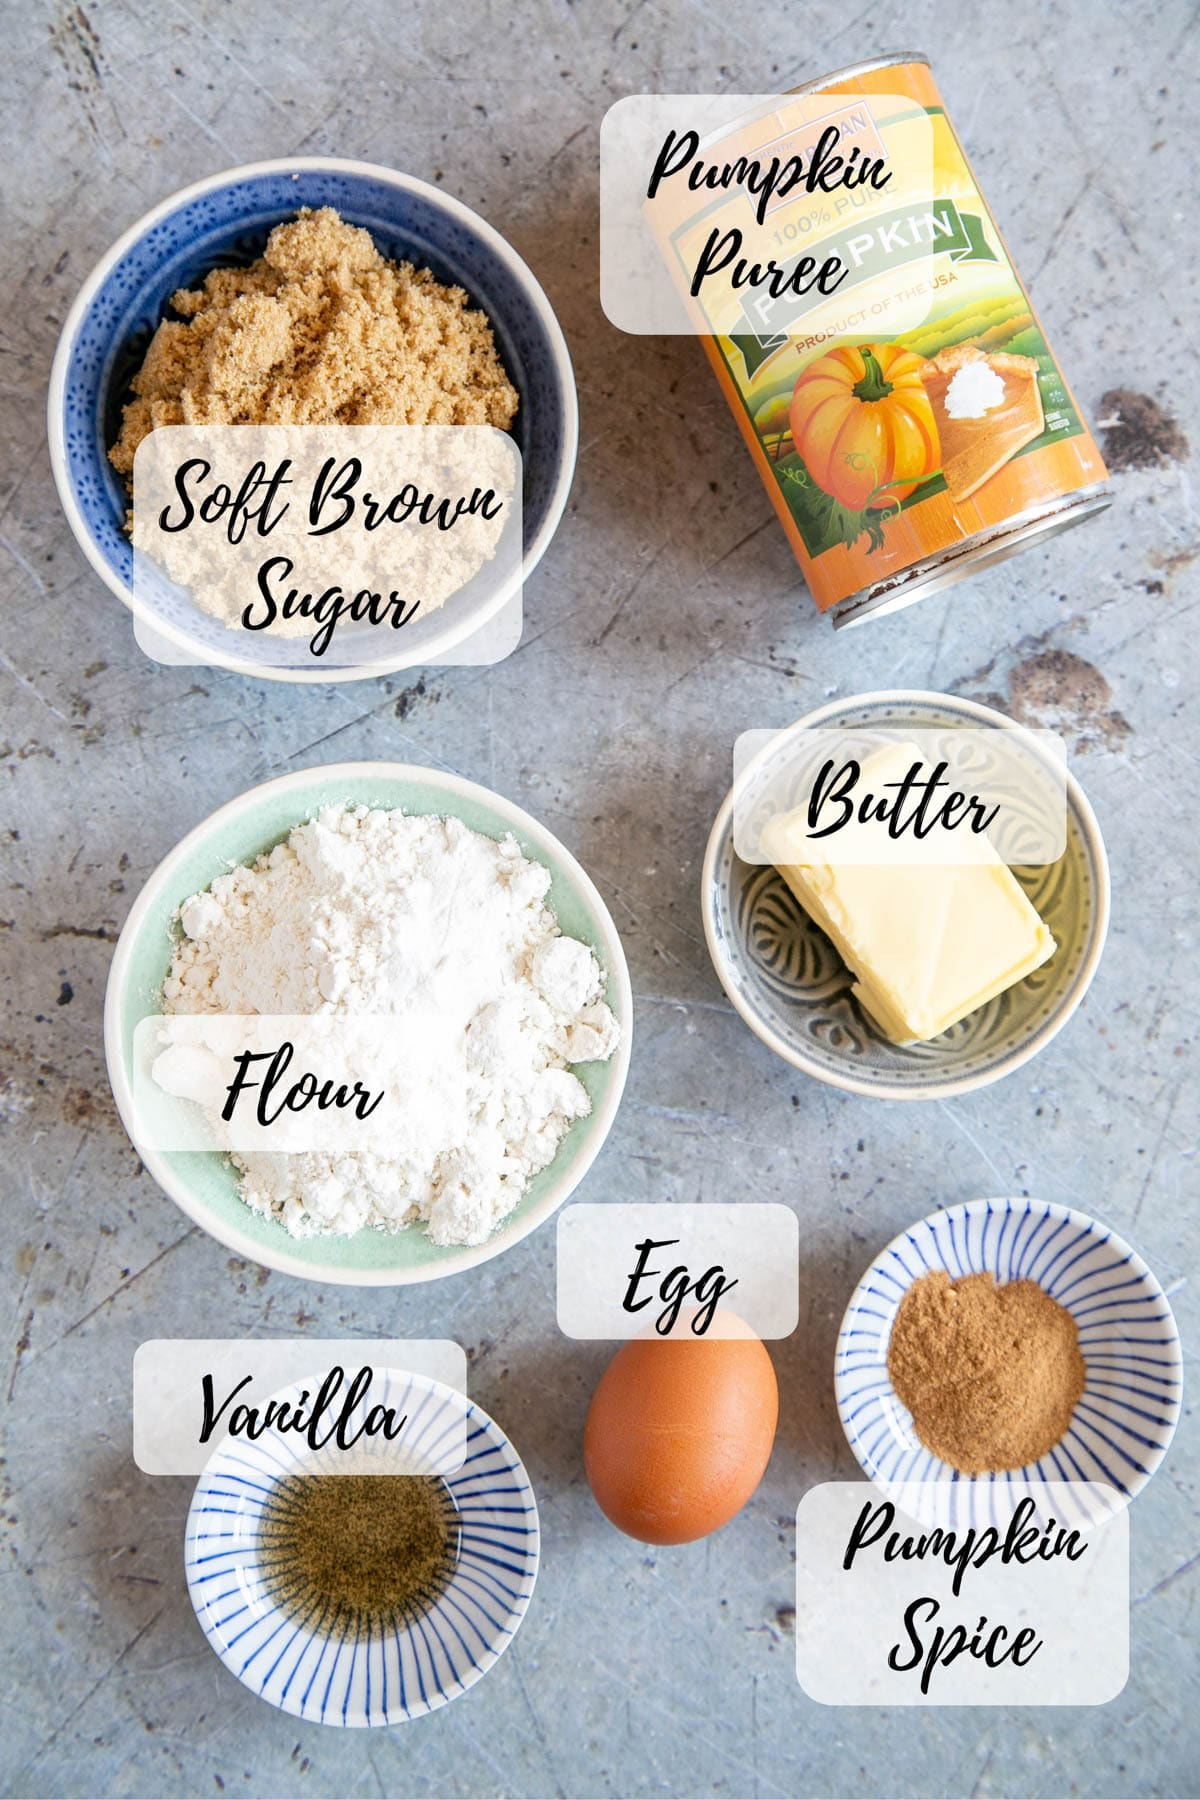 The ingredients for pumpkin blondies: tinned pumpkin puree, soft brown sugar, butter, flour, vanilla extract, pumpkin spice, and an egg.